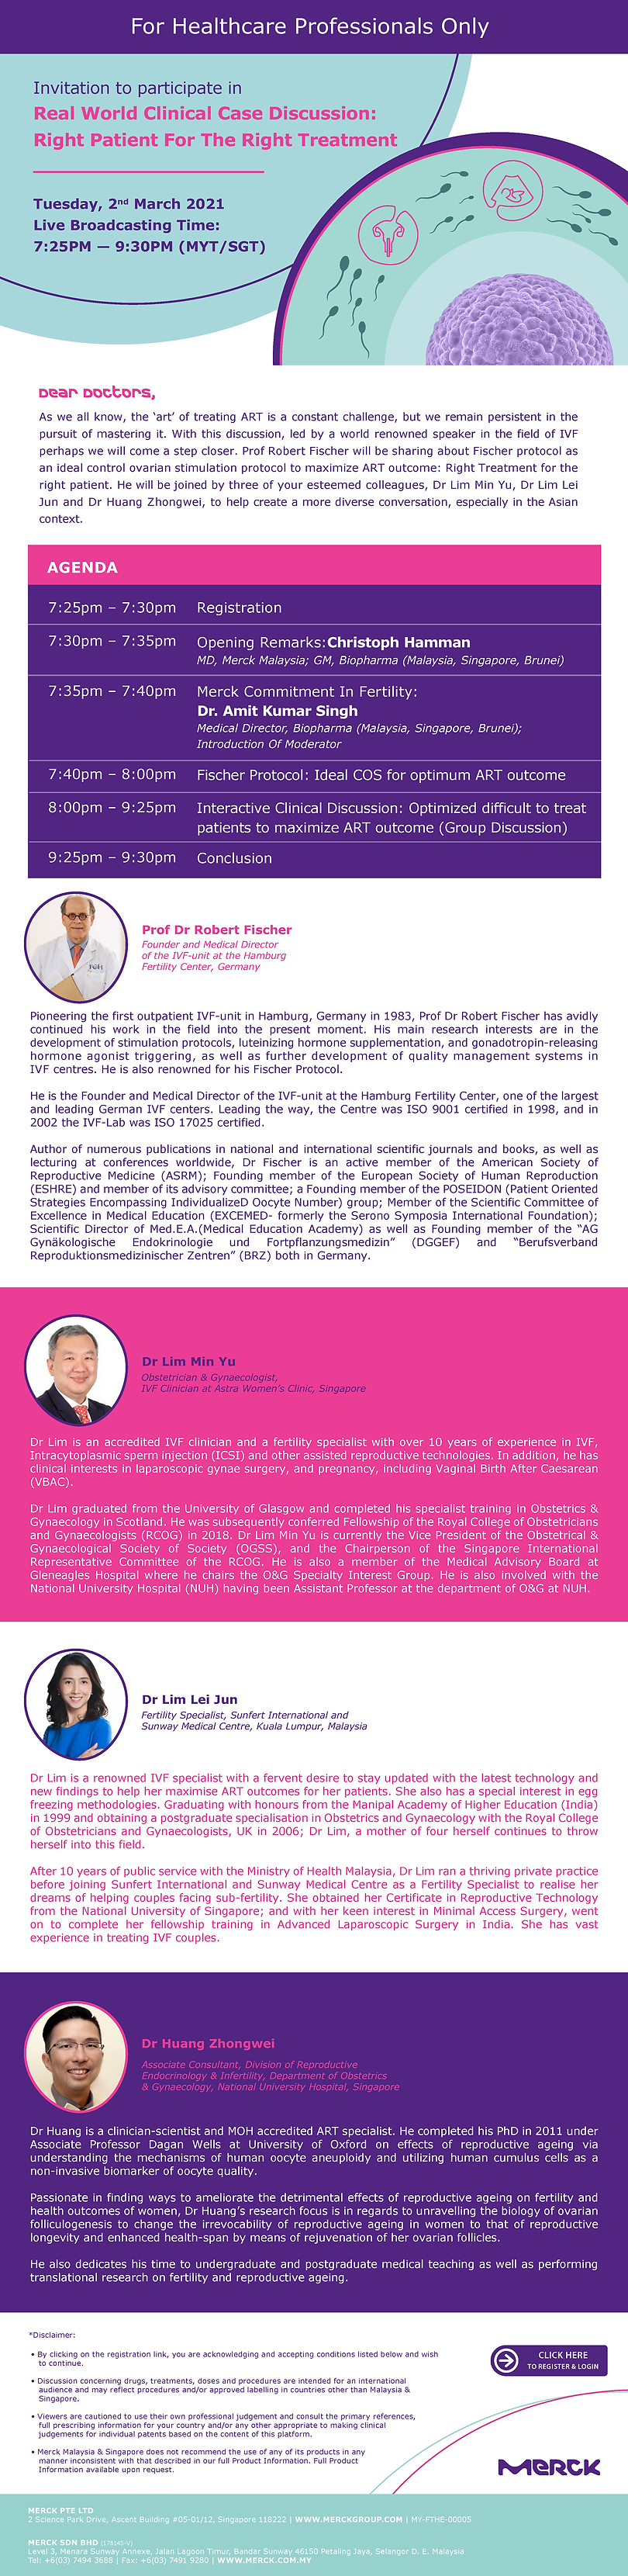 FA_Merck Expert Group Meeting_Clinical C